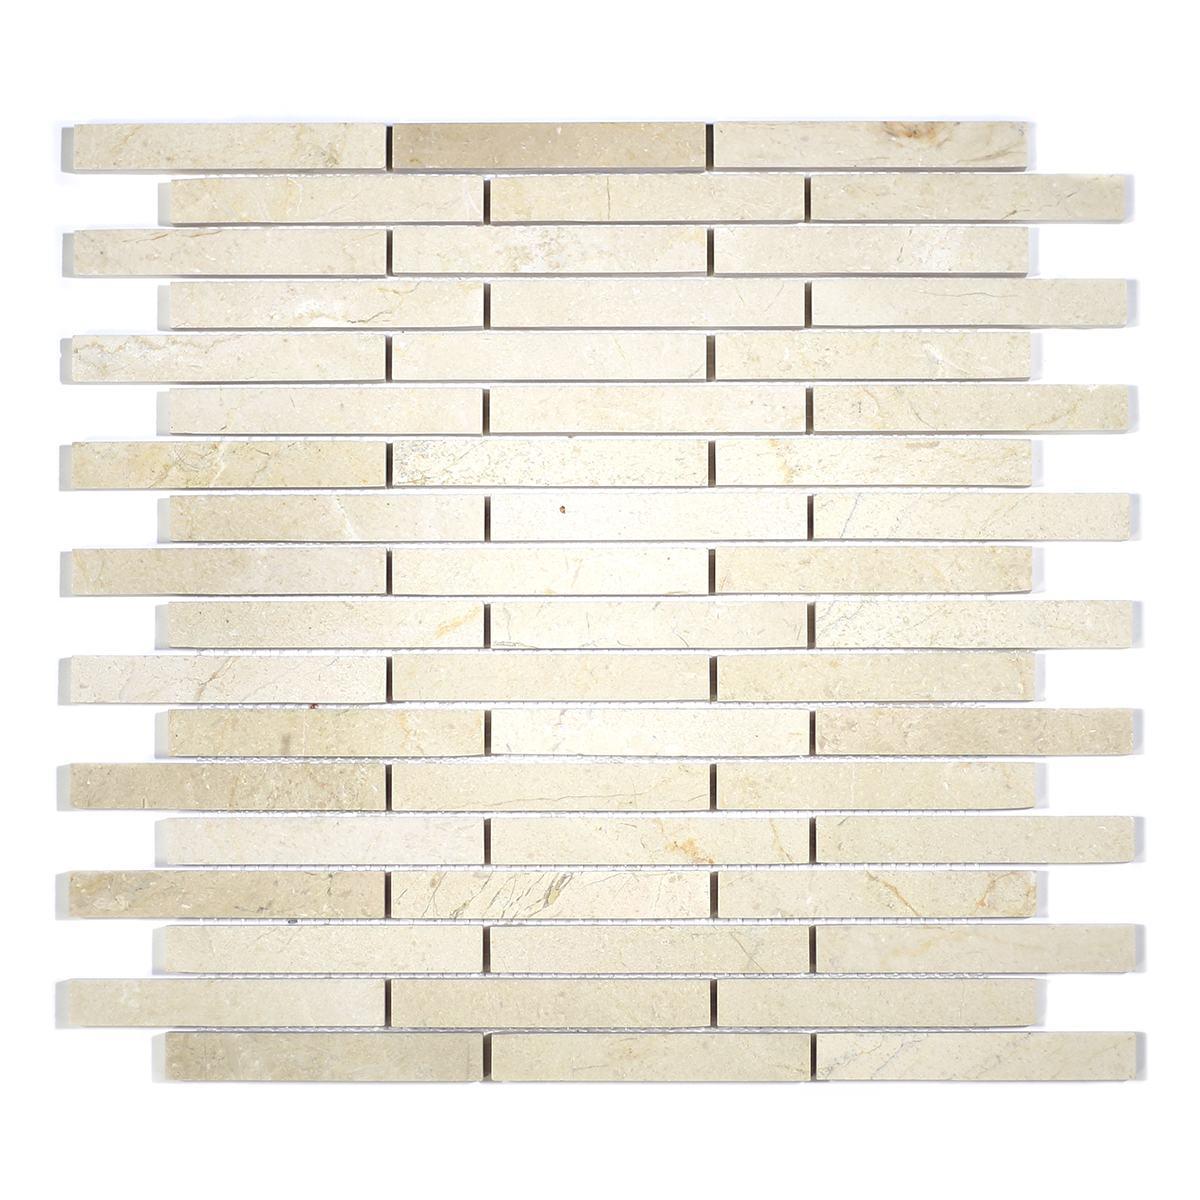 MA210-ST  5/8 Crema Marfil Strips with space polished